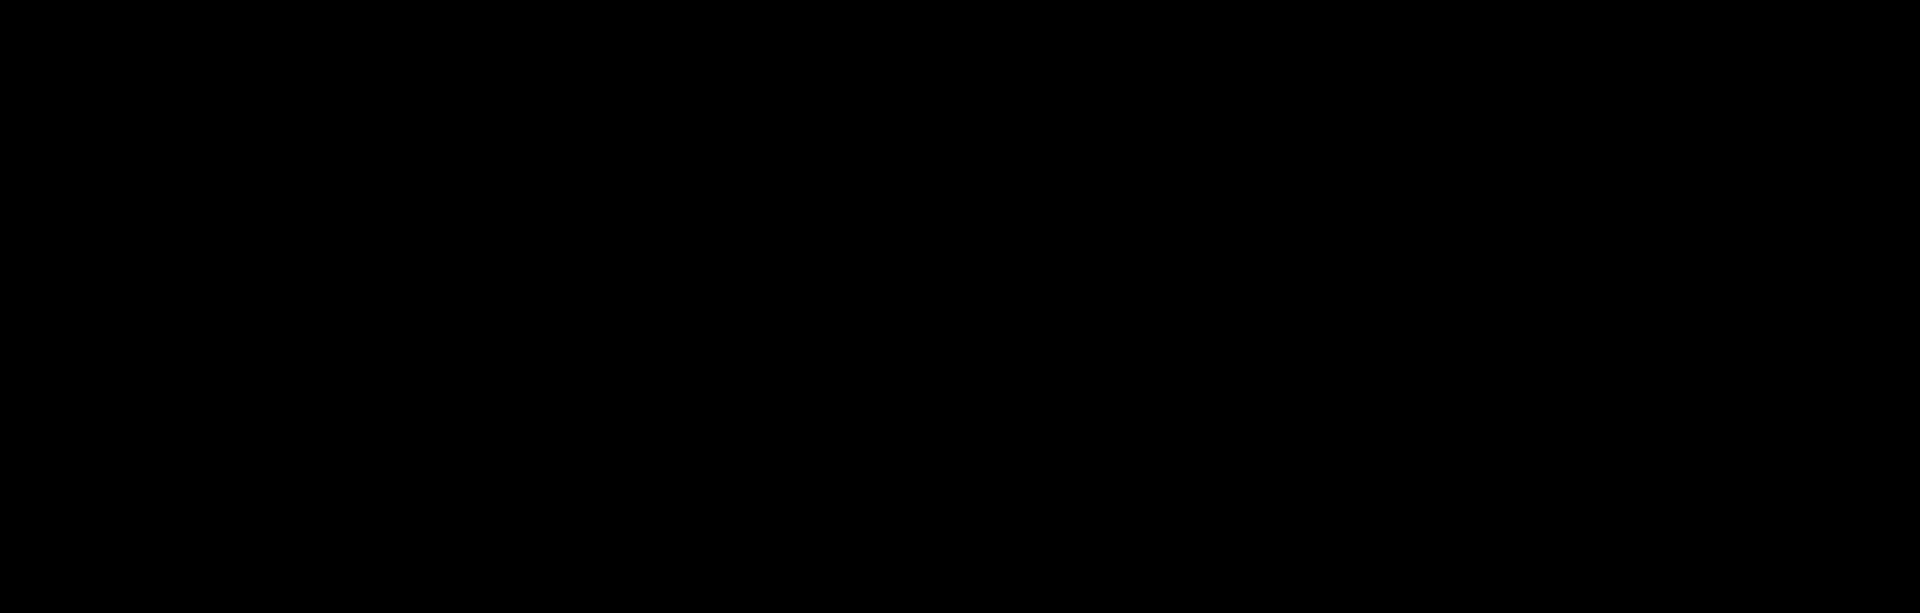 00 1949 101